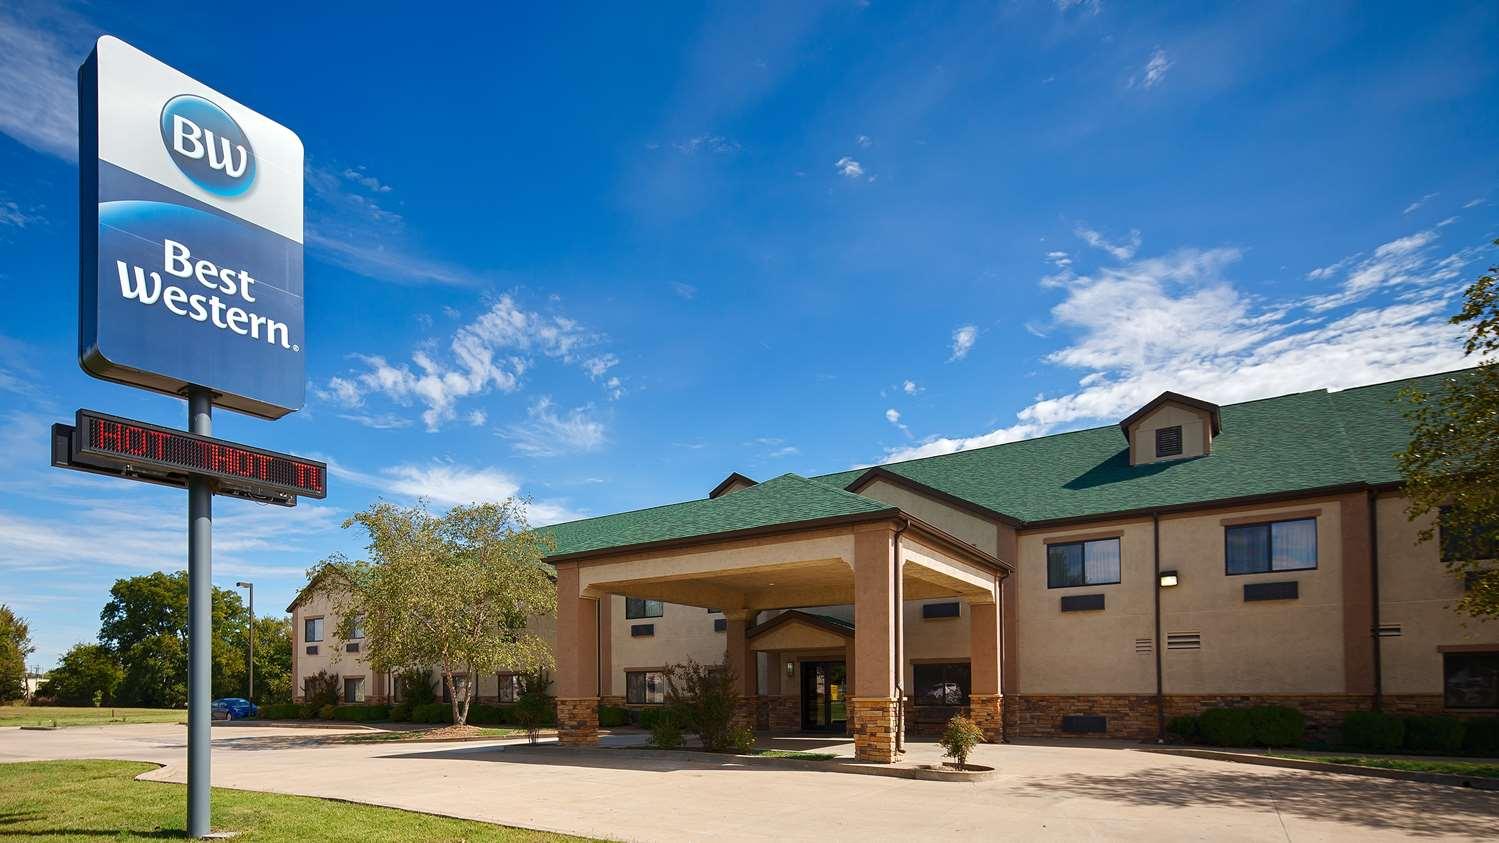 Coffeyville Hotels Best Western Bricktown Lodge Dalton Defenders Museum Hotel